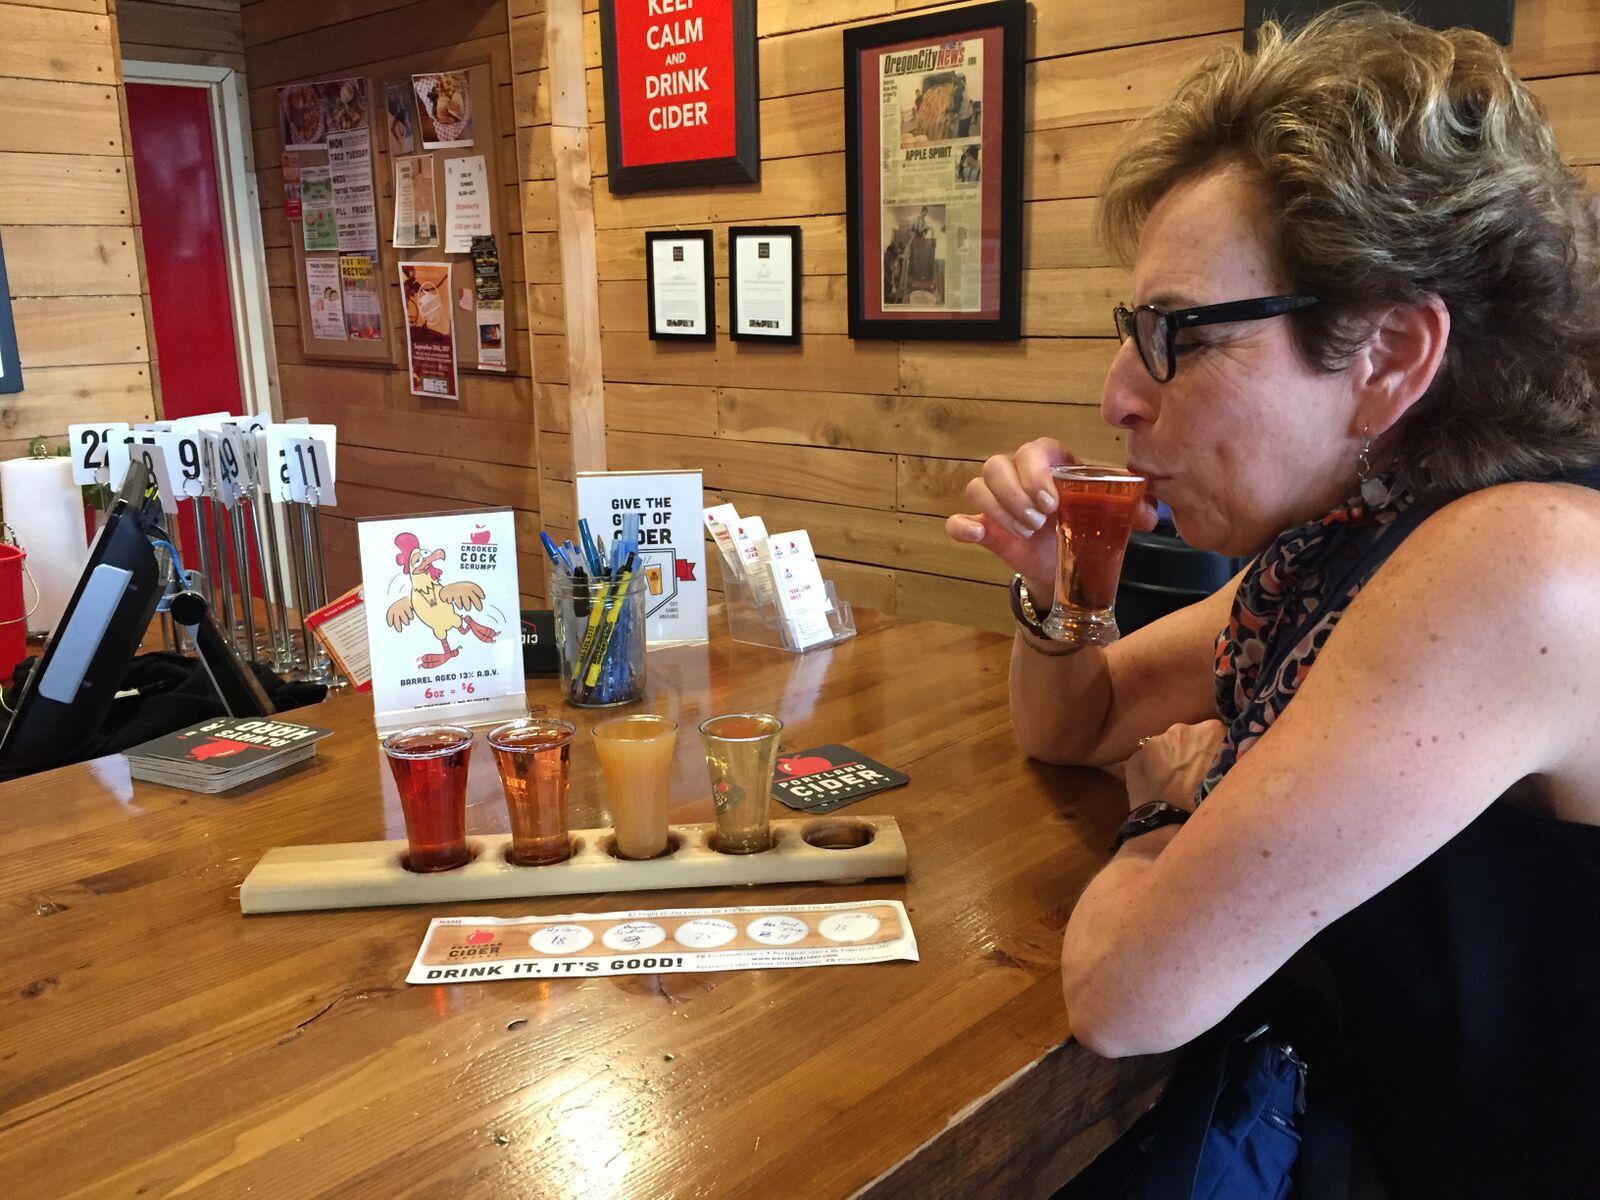 Enjoy a flight of cider at Portland Cider Company.